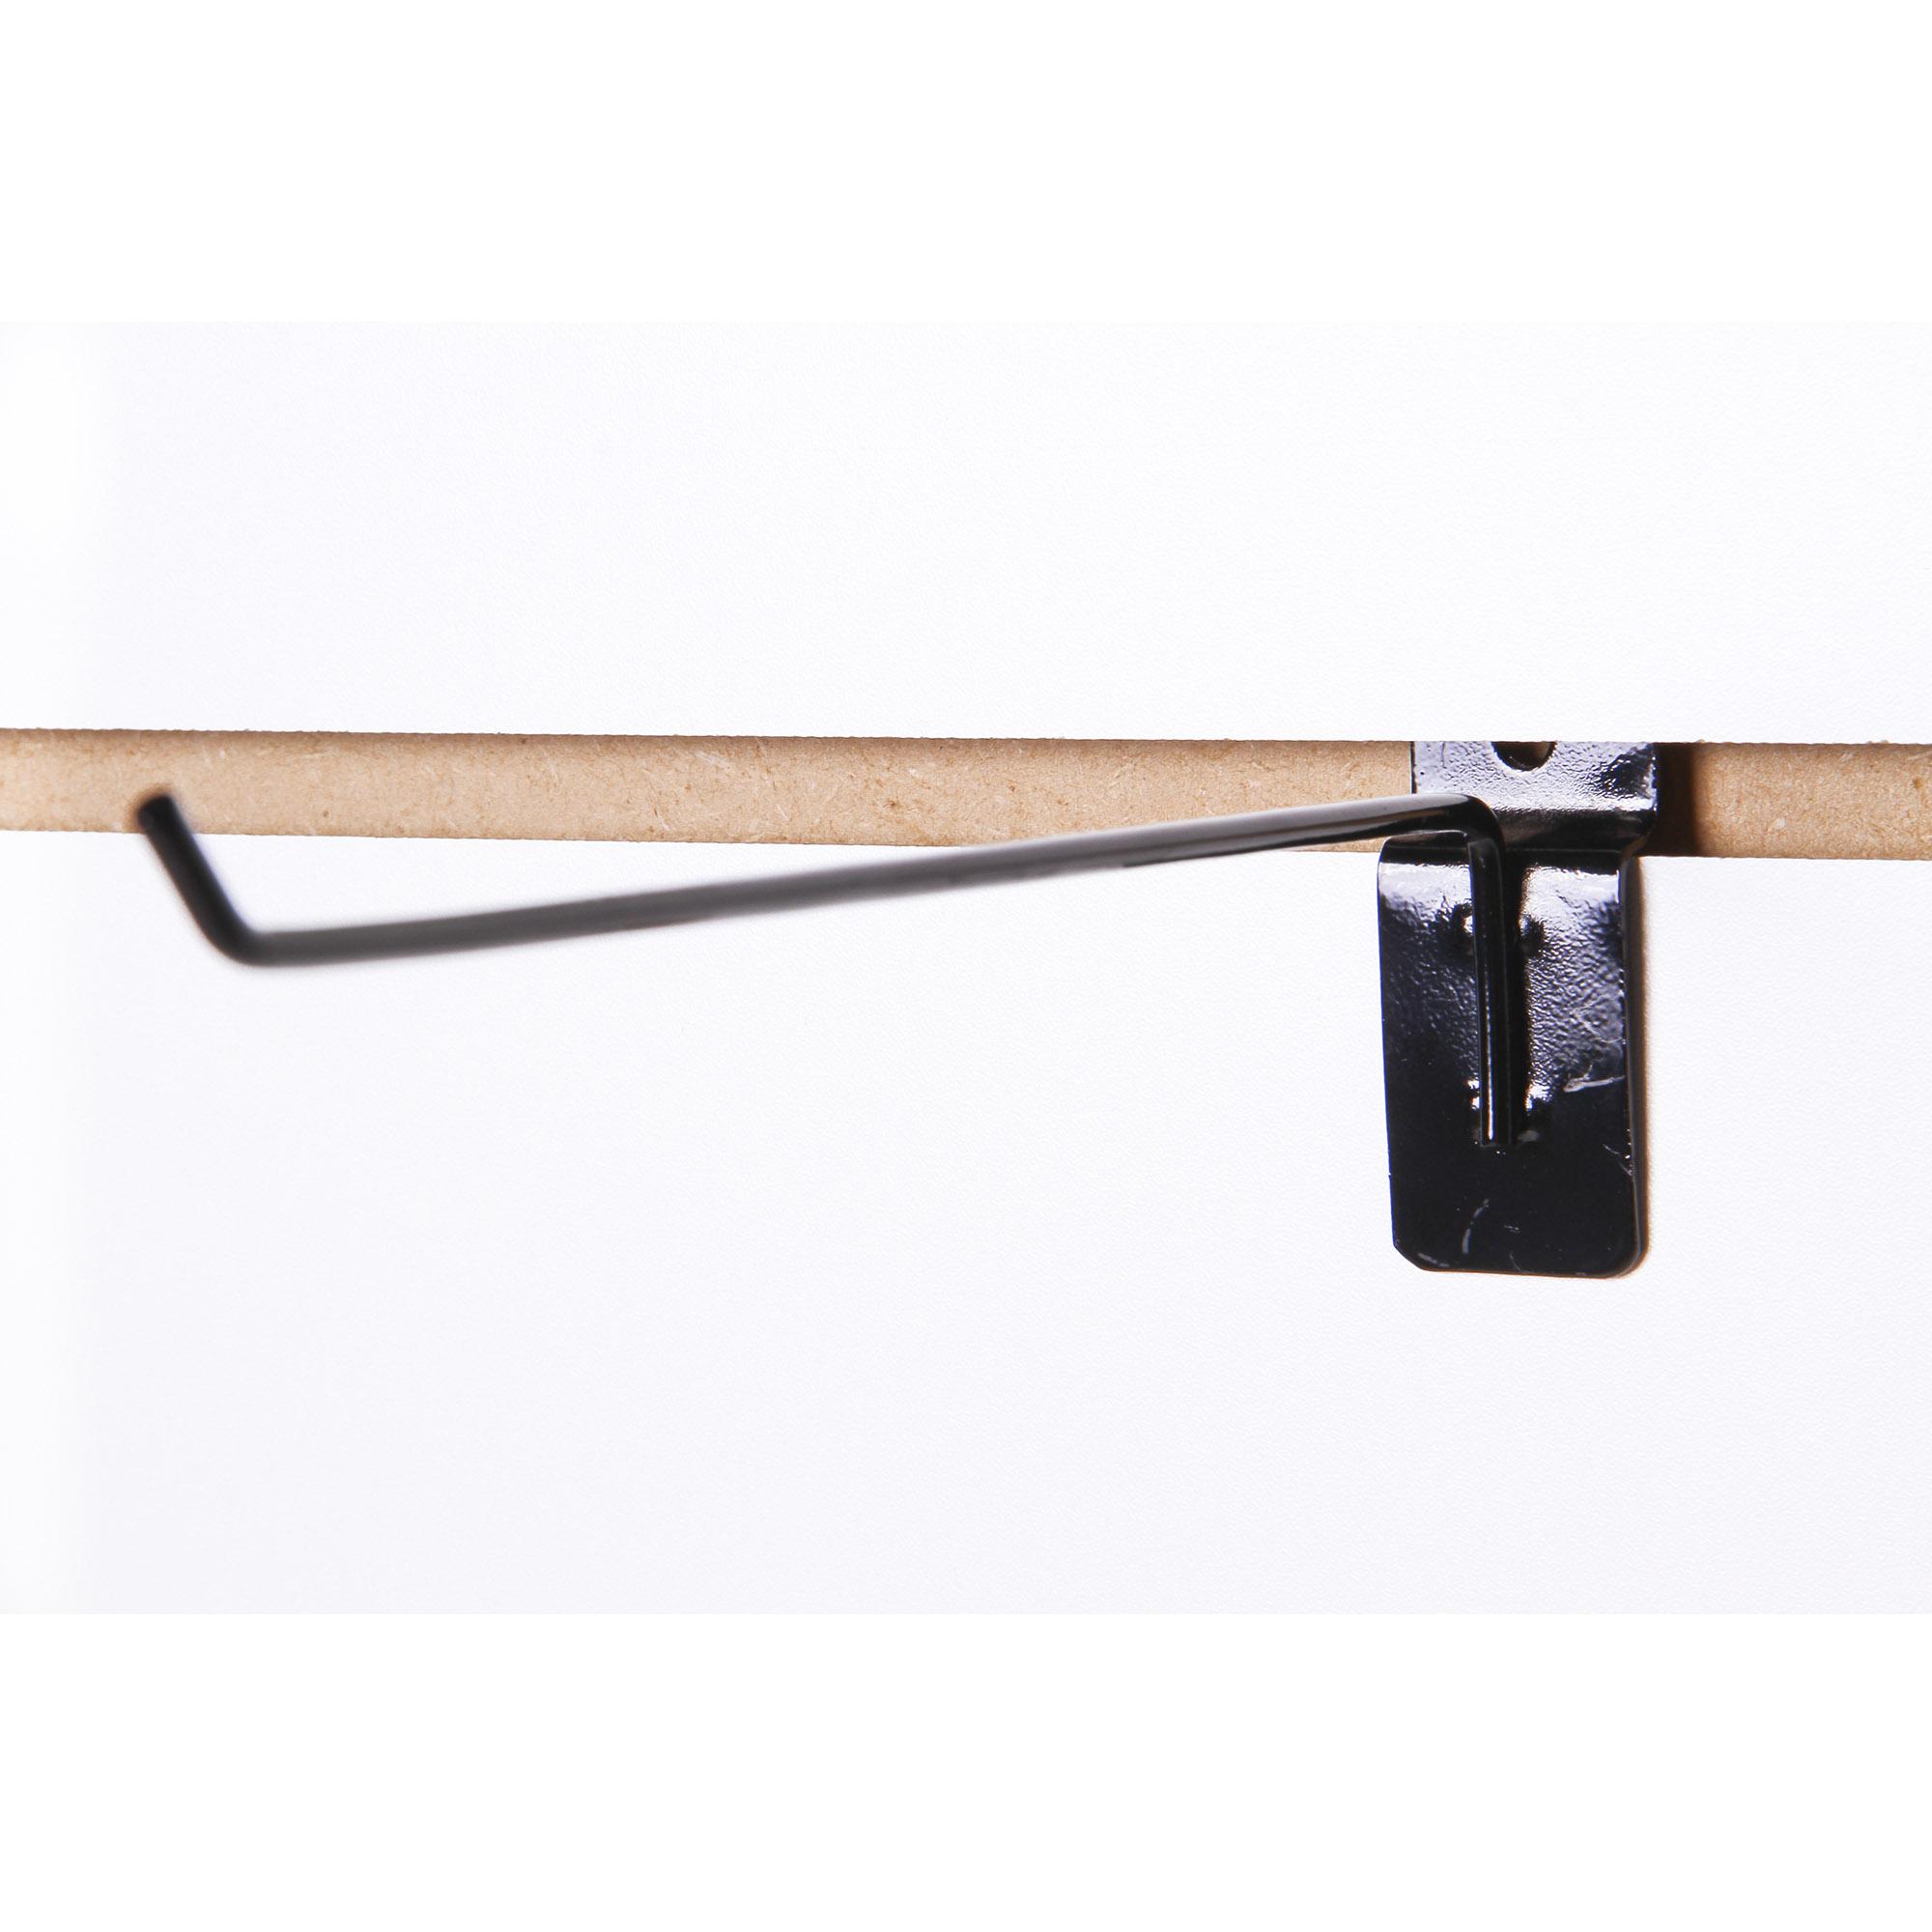 Kit Gancho Painel Canaletado 20cm - 50 unidades